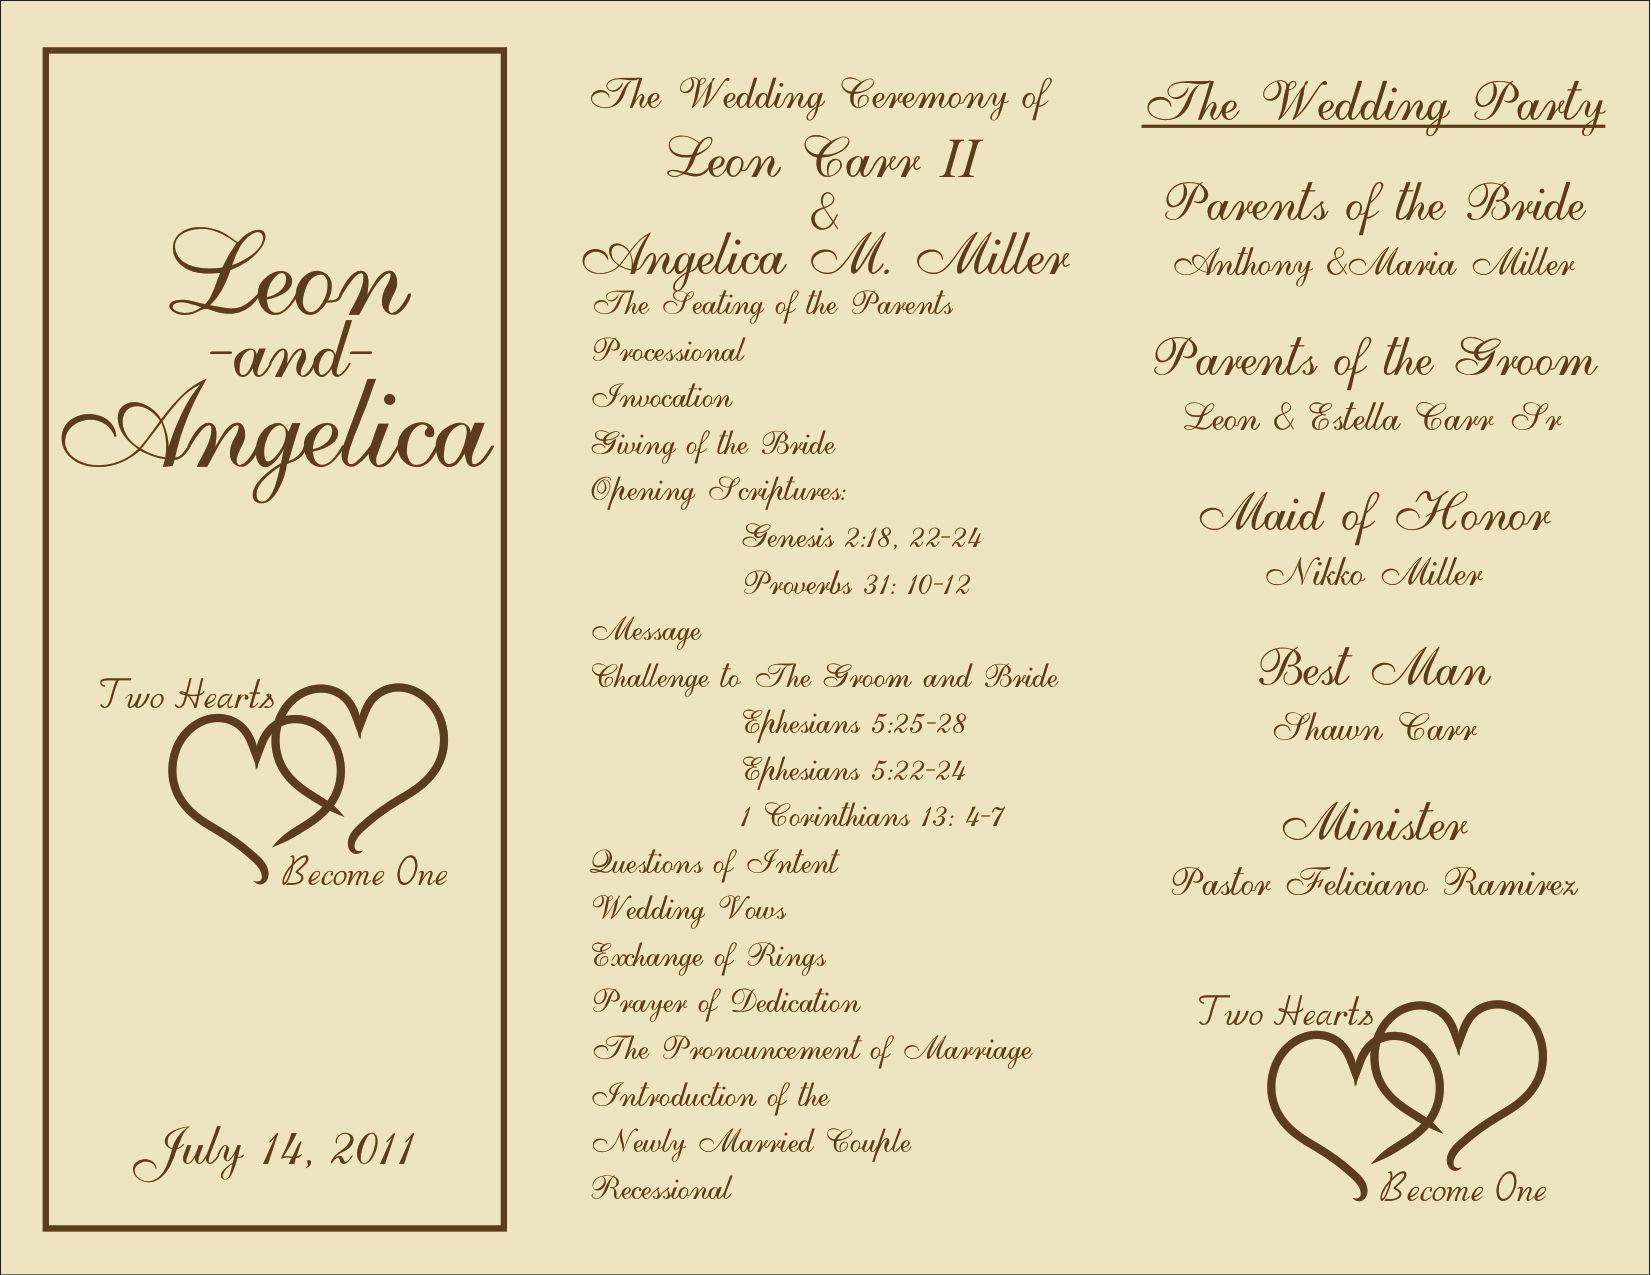 006 Dreaded Free Word Template For Wedding Program Image  ProgramsFull